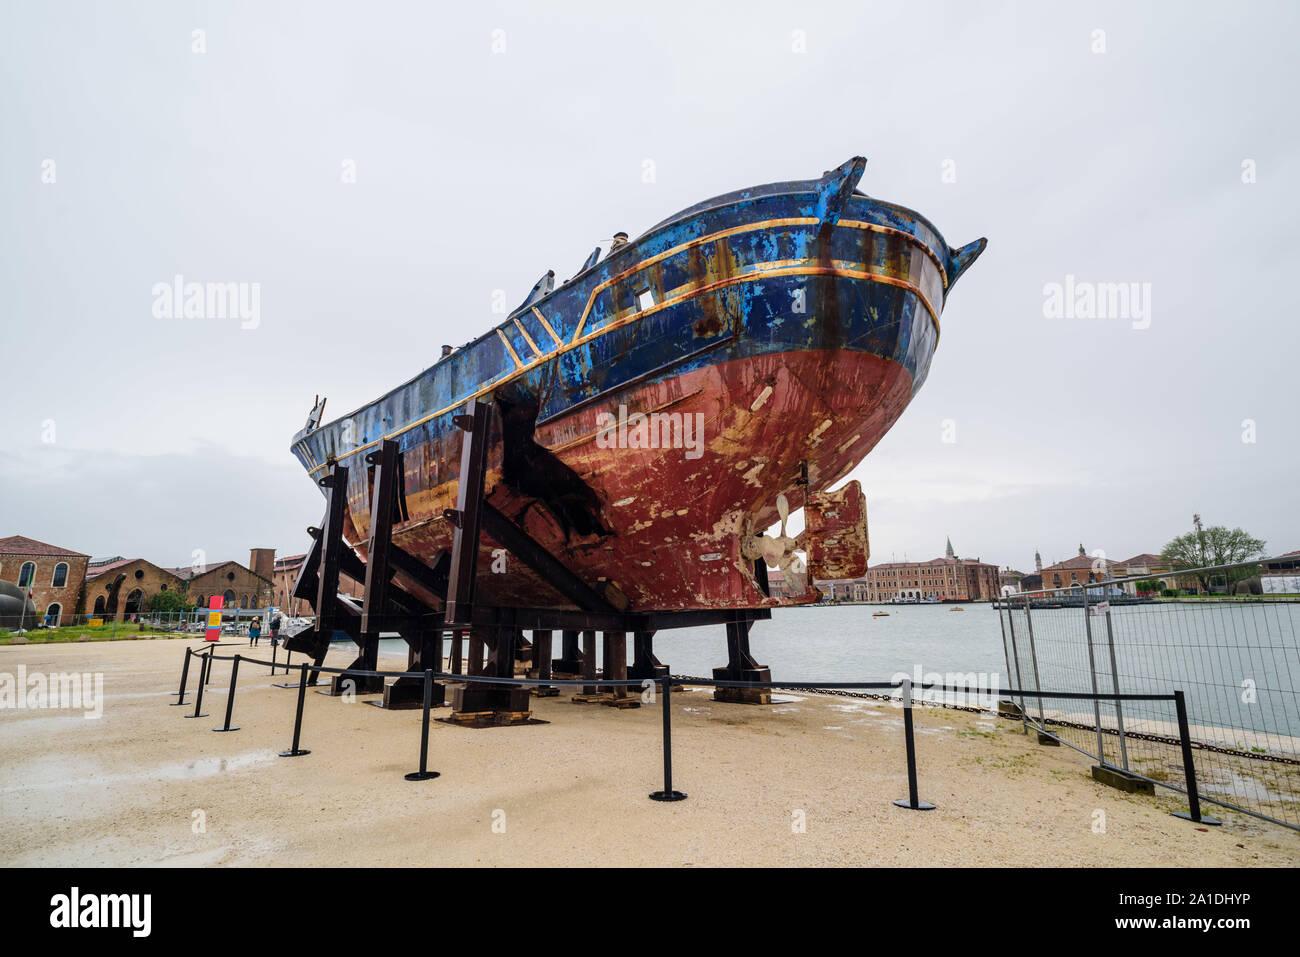 Venice, Biennale 2019, May You Live In Interesting Times; Christoph Büchel, 'Barca Nostra 2018-2019', '2250 x 710 x 860', 'Schiffswrack 18. April 2015 Stock Photo